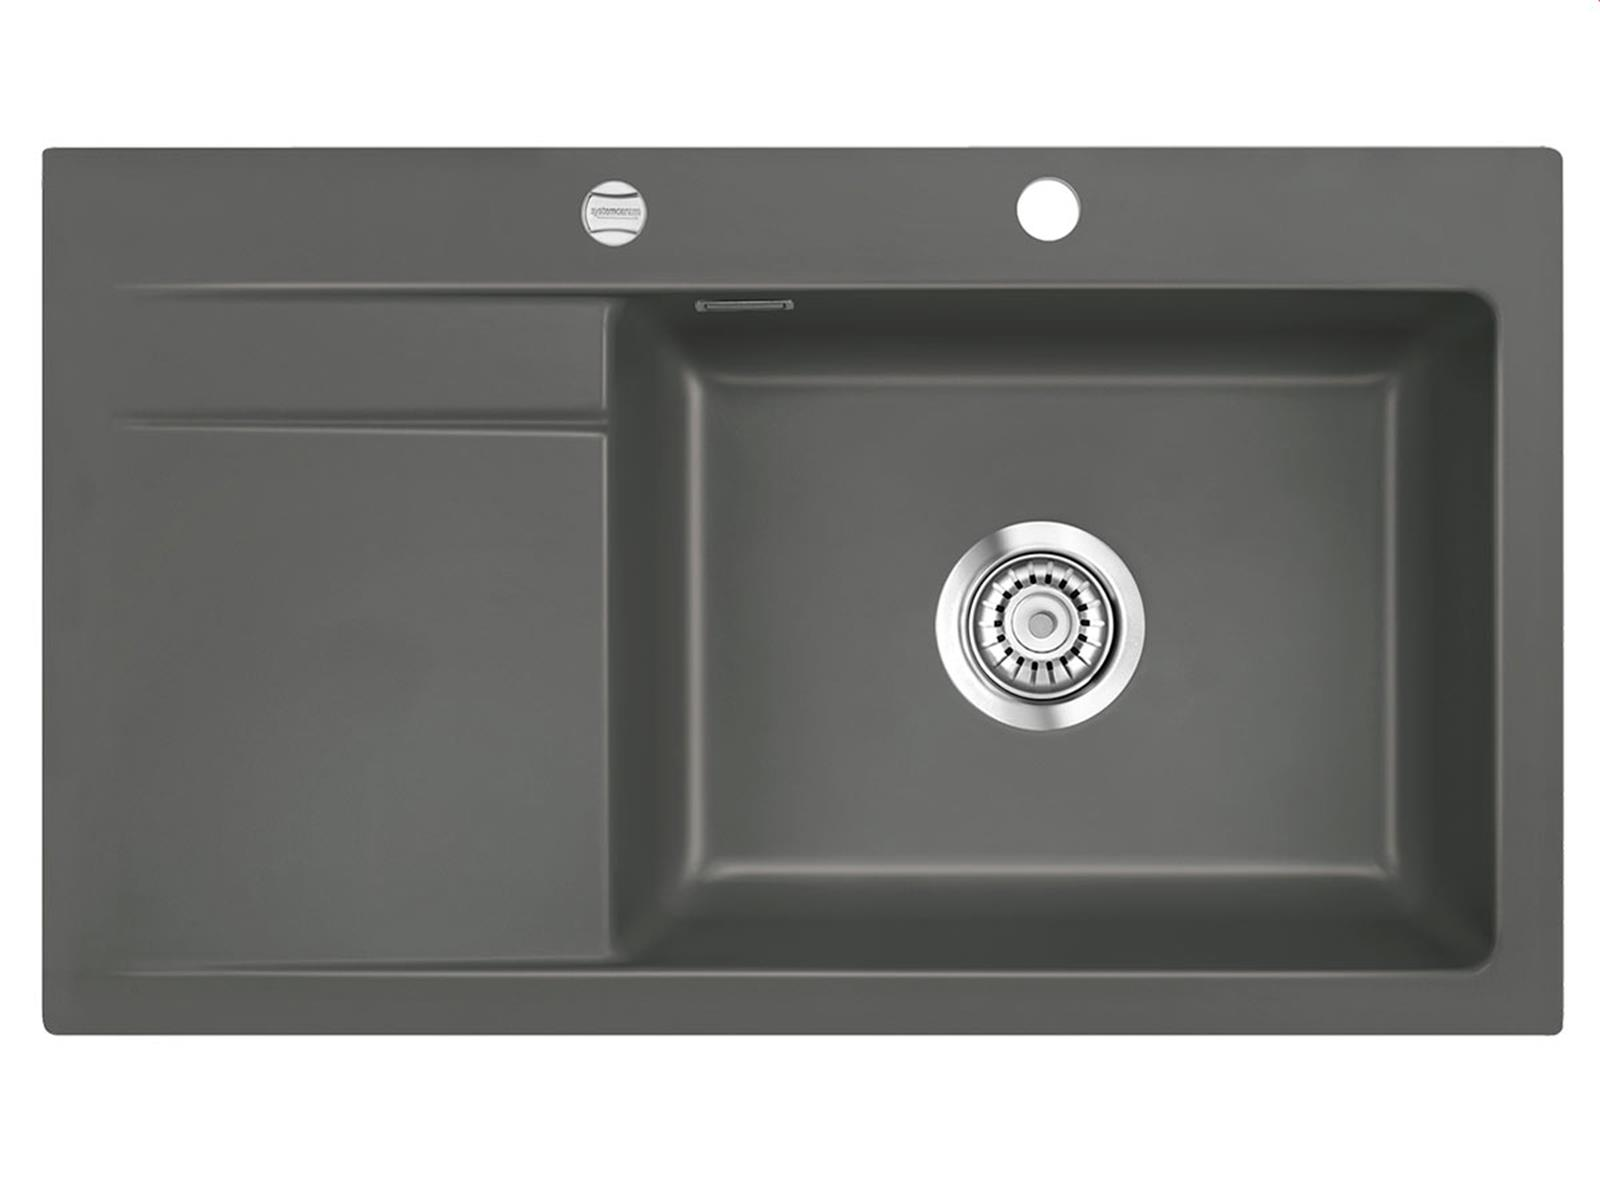 Systemceram Stema 86 SL Lava Keramikspüle Excenterbetätigung